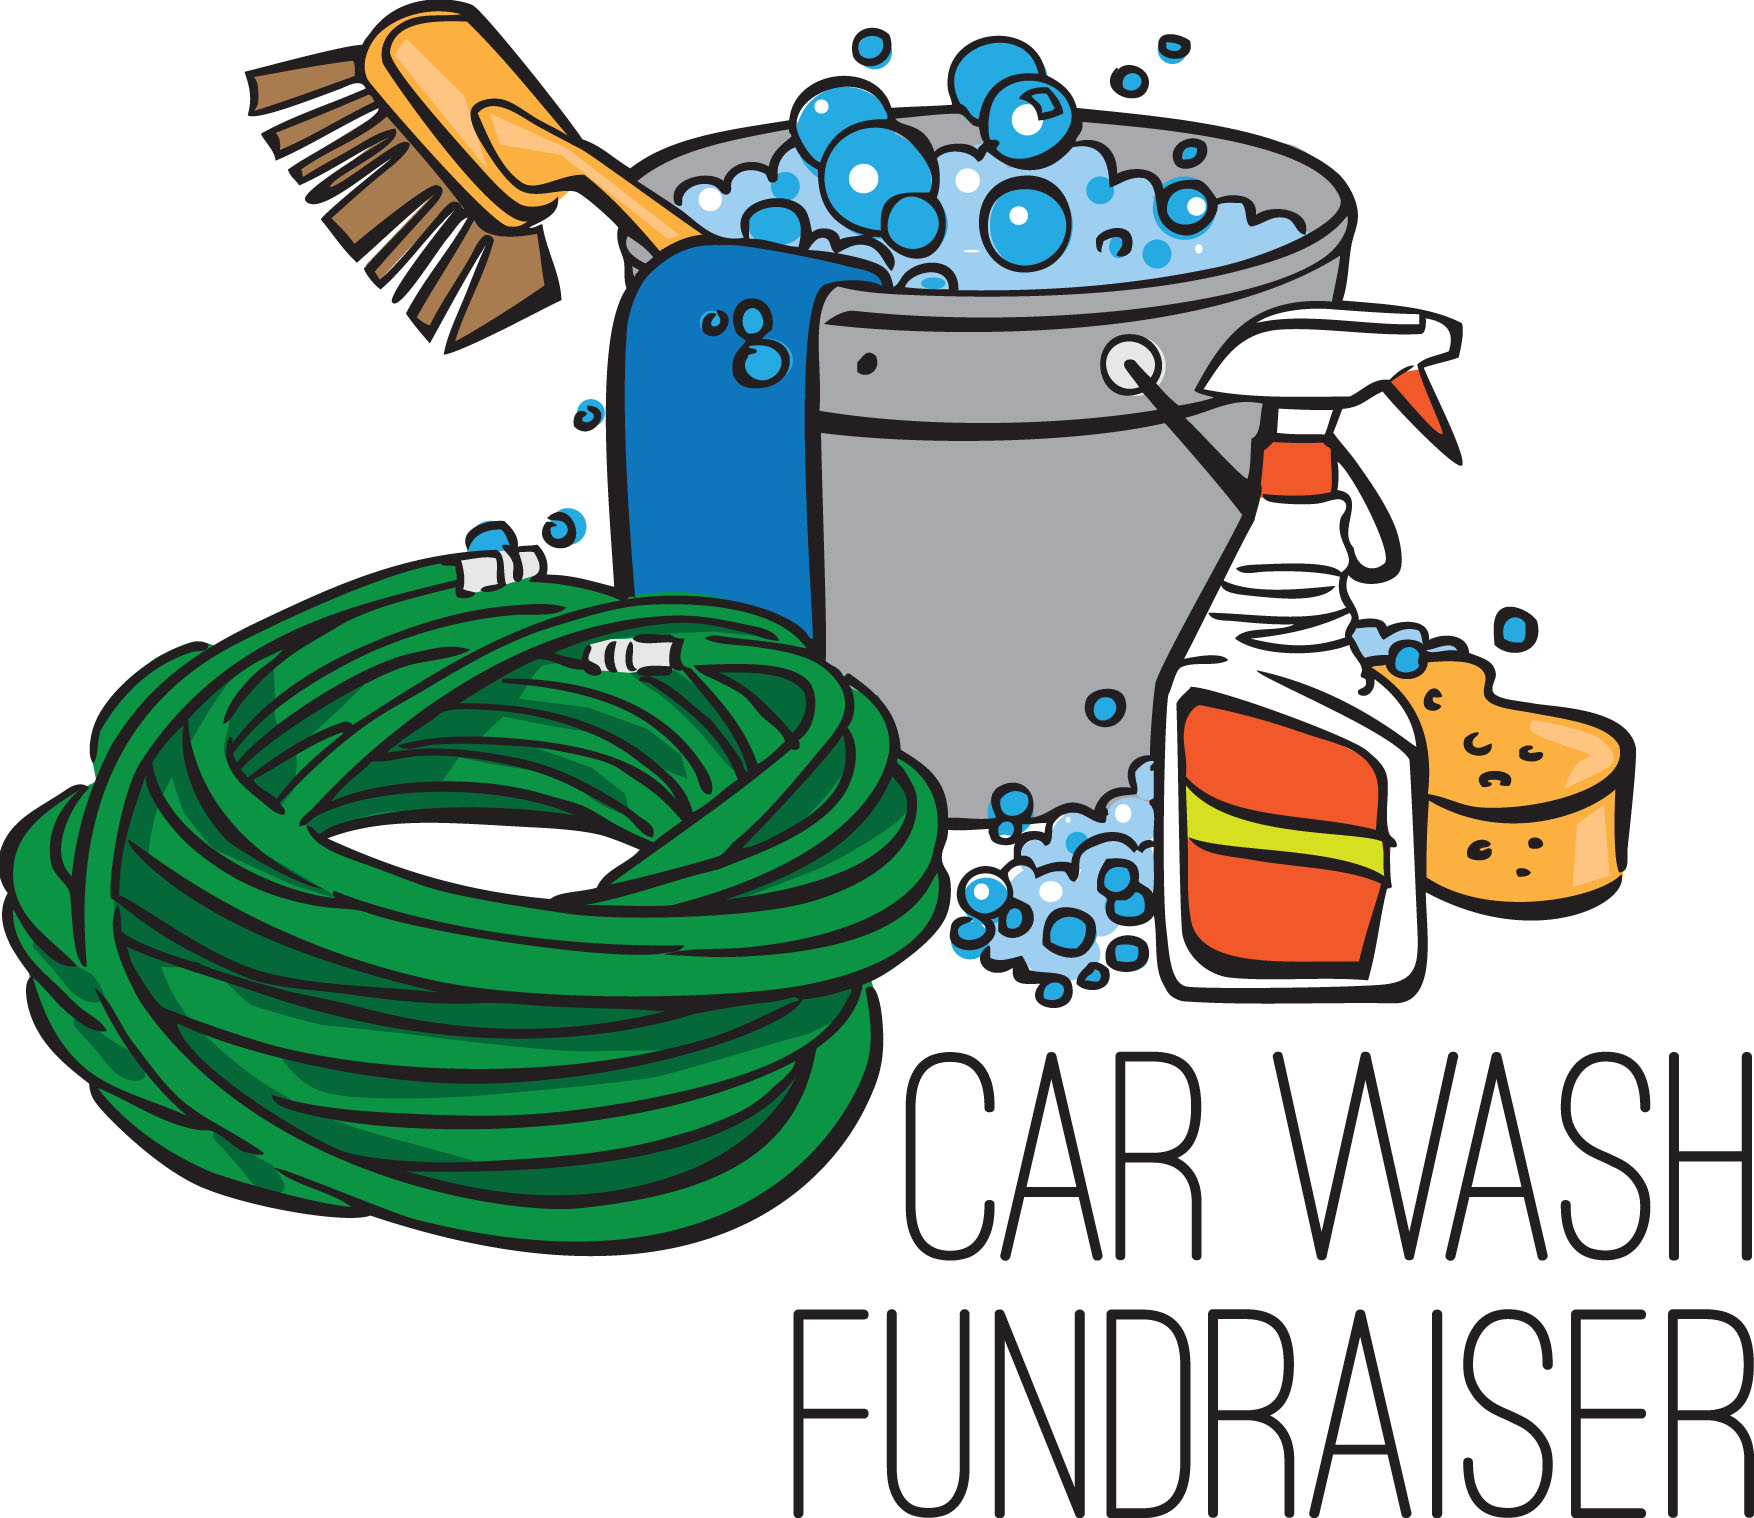 Car Wash Drawing at GetDrawings.com | Free for personal use Car Wash ...